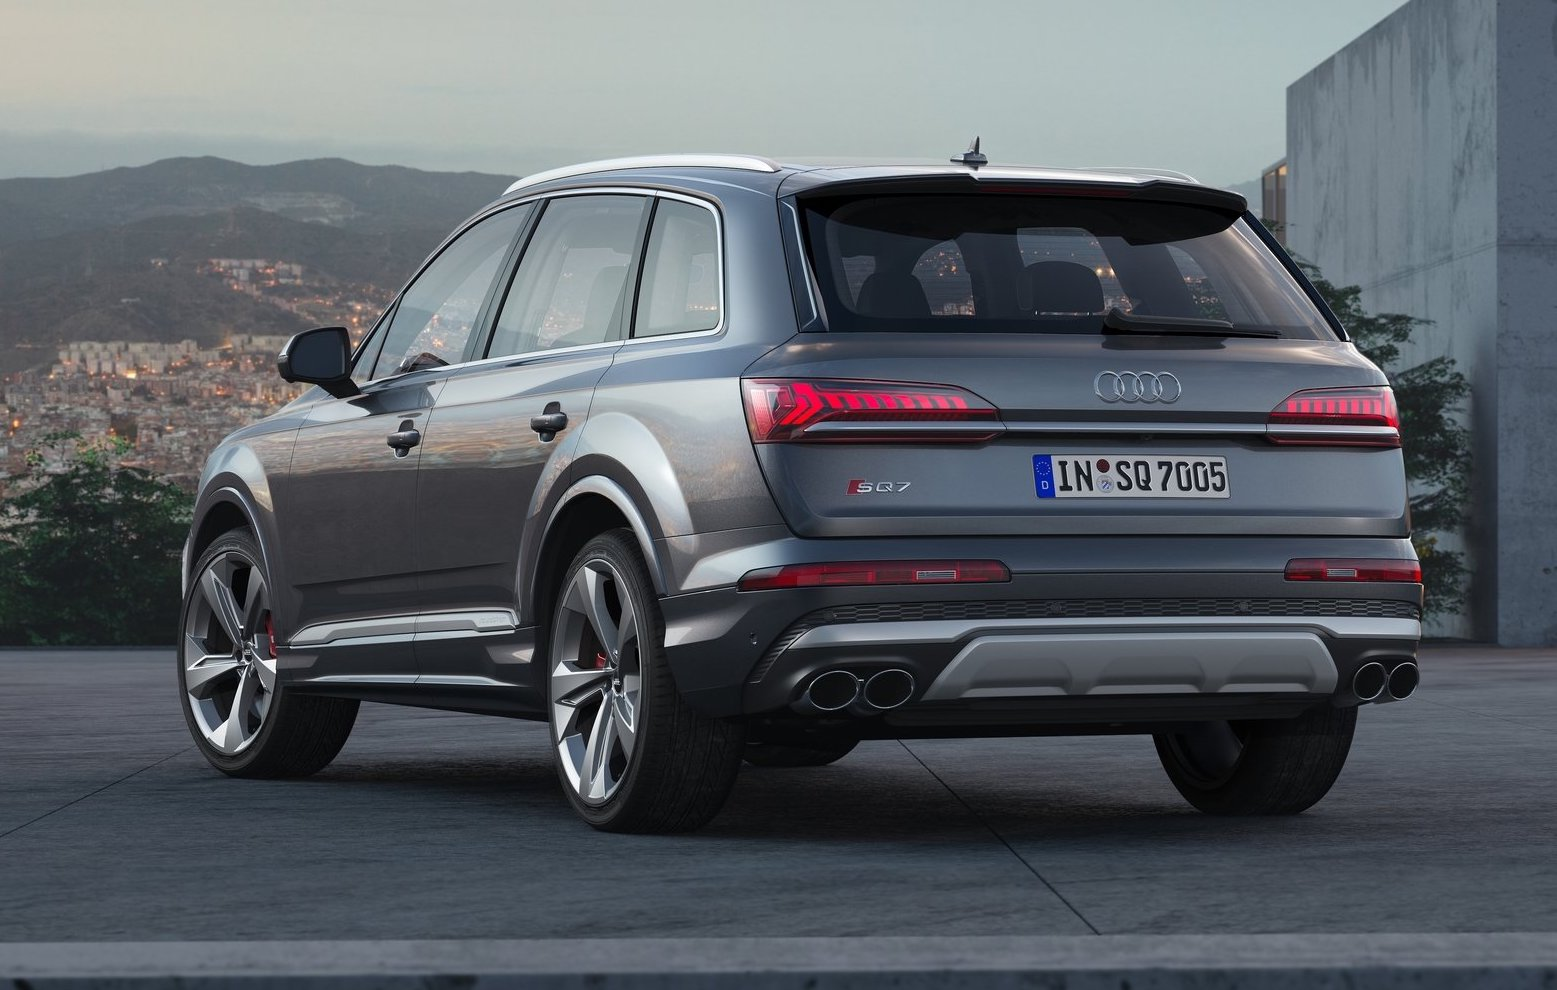 2020 Audi Sq7 Tdi Revealed Gets 900nm V8 Performancedrive